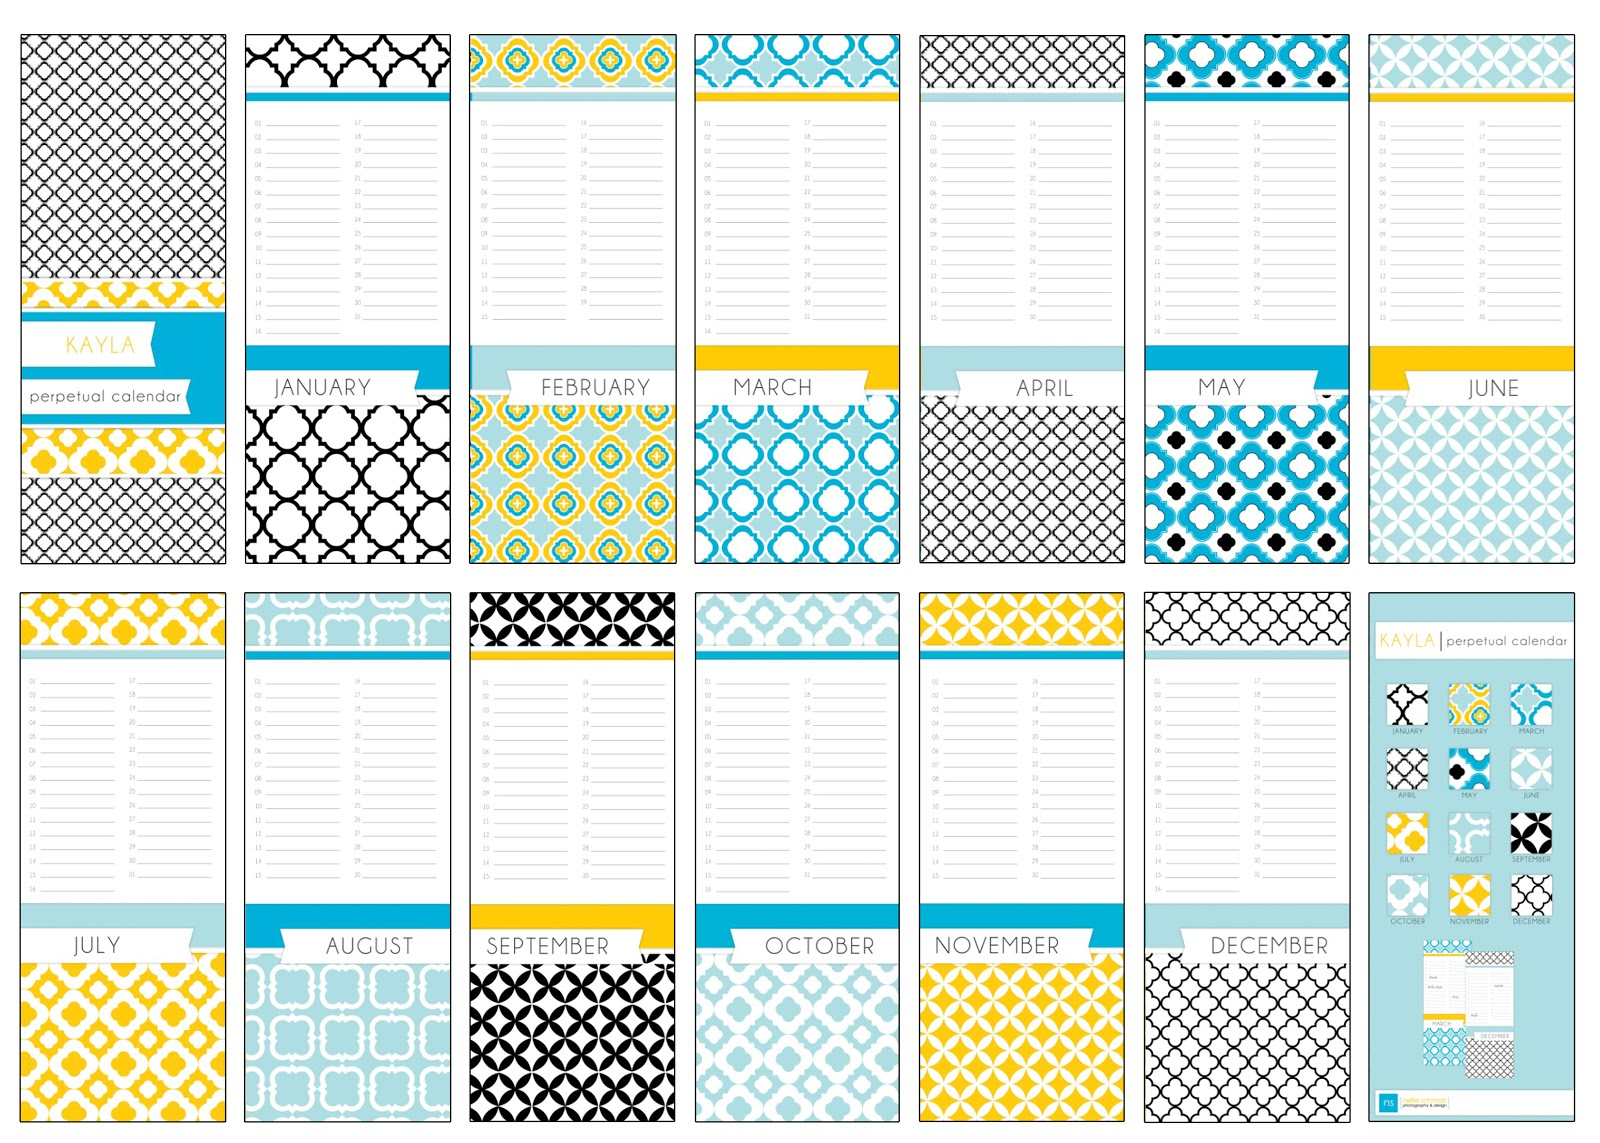 birthday calendar template – Birthday Calendar Template